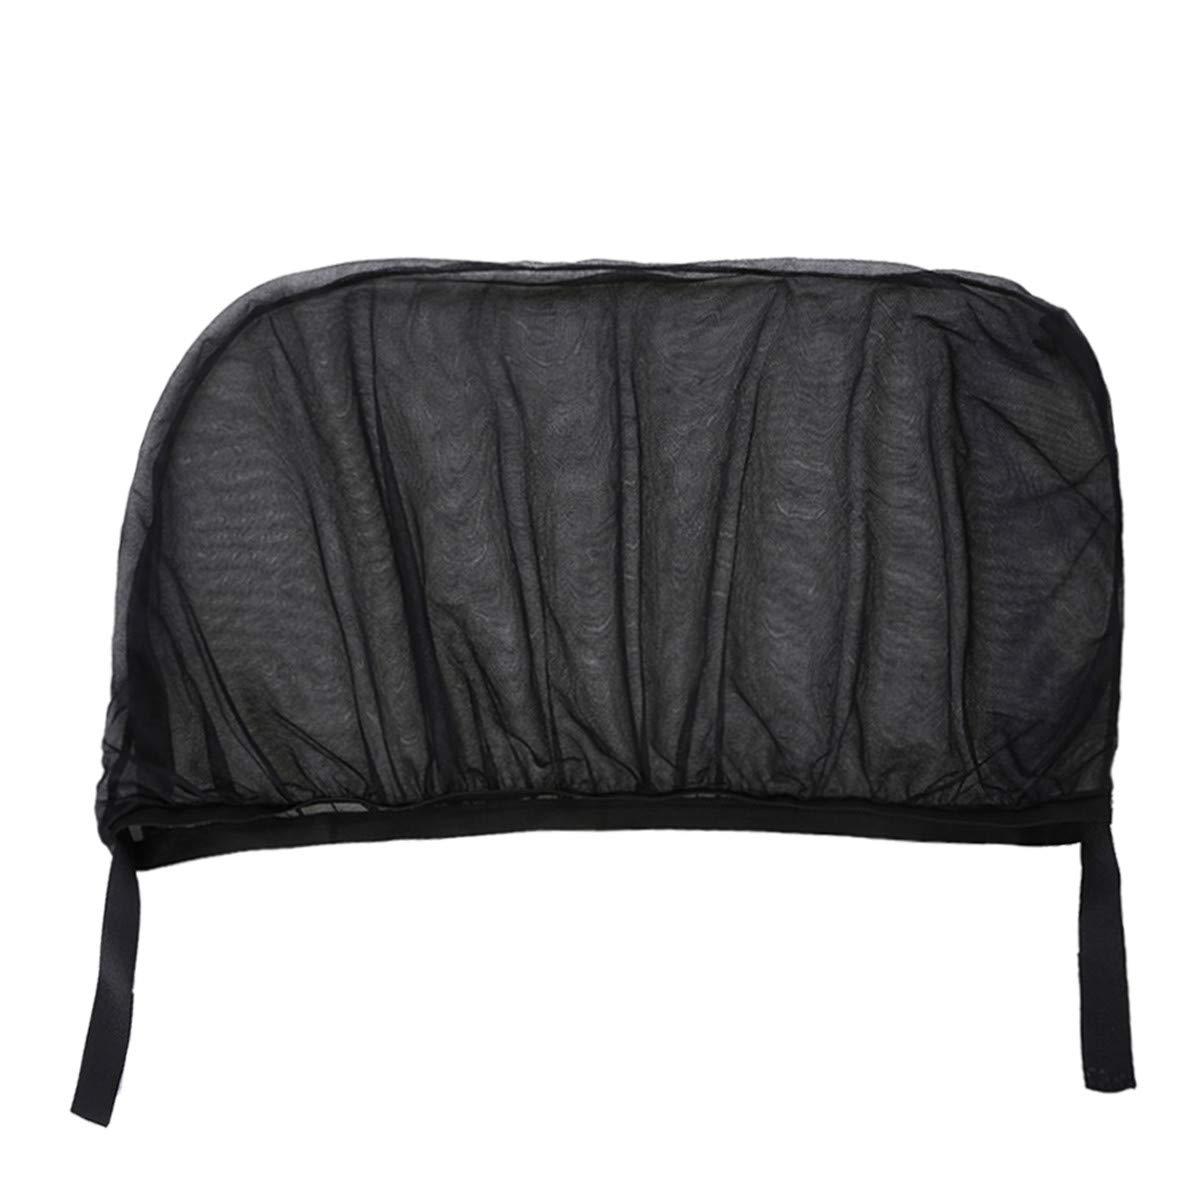 LKXHarleya 2Pcs/lot Car Sun Visor Rear Side Window Sun Shade Mesh Fabric Sun Visor Shade Cover Shield UV Protector Black Auto Sunshade Curtain